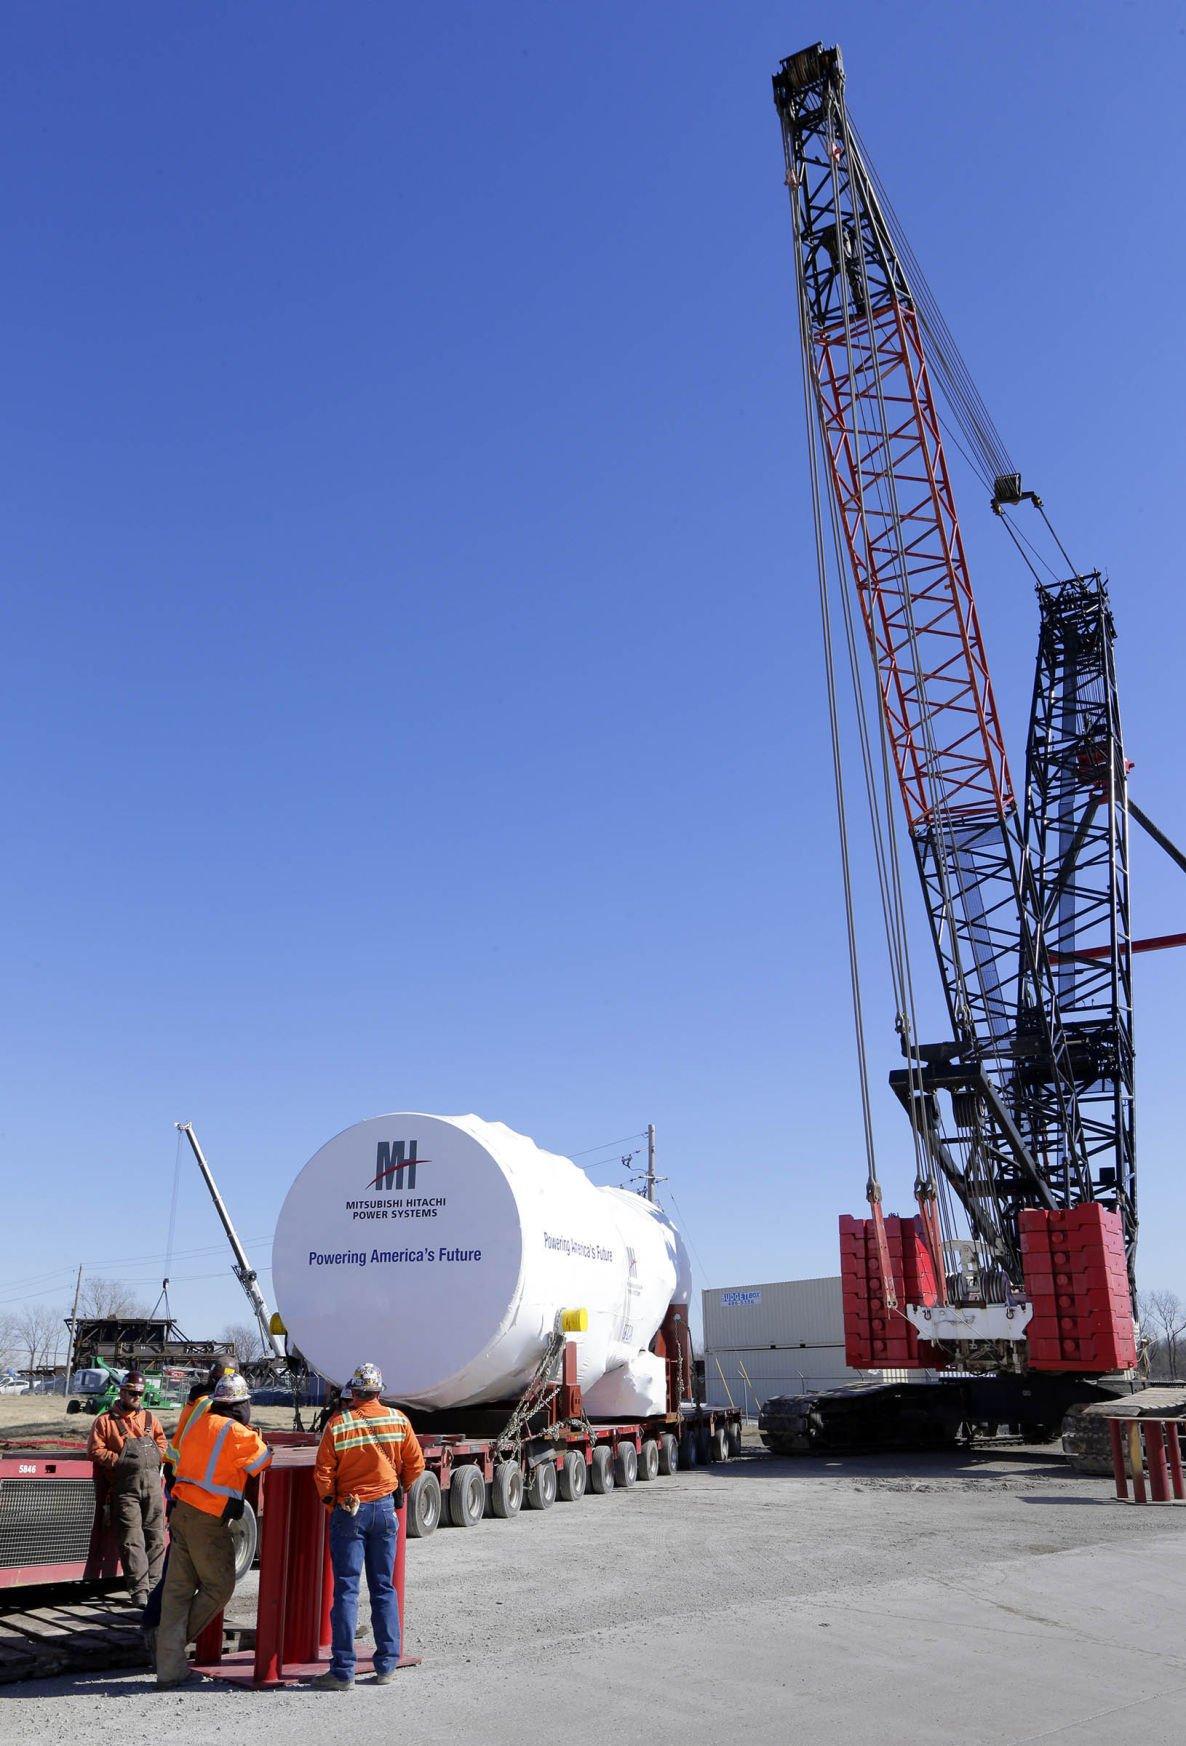 New GRDA turbine will be most efficient power generator in Western